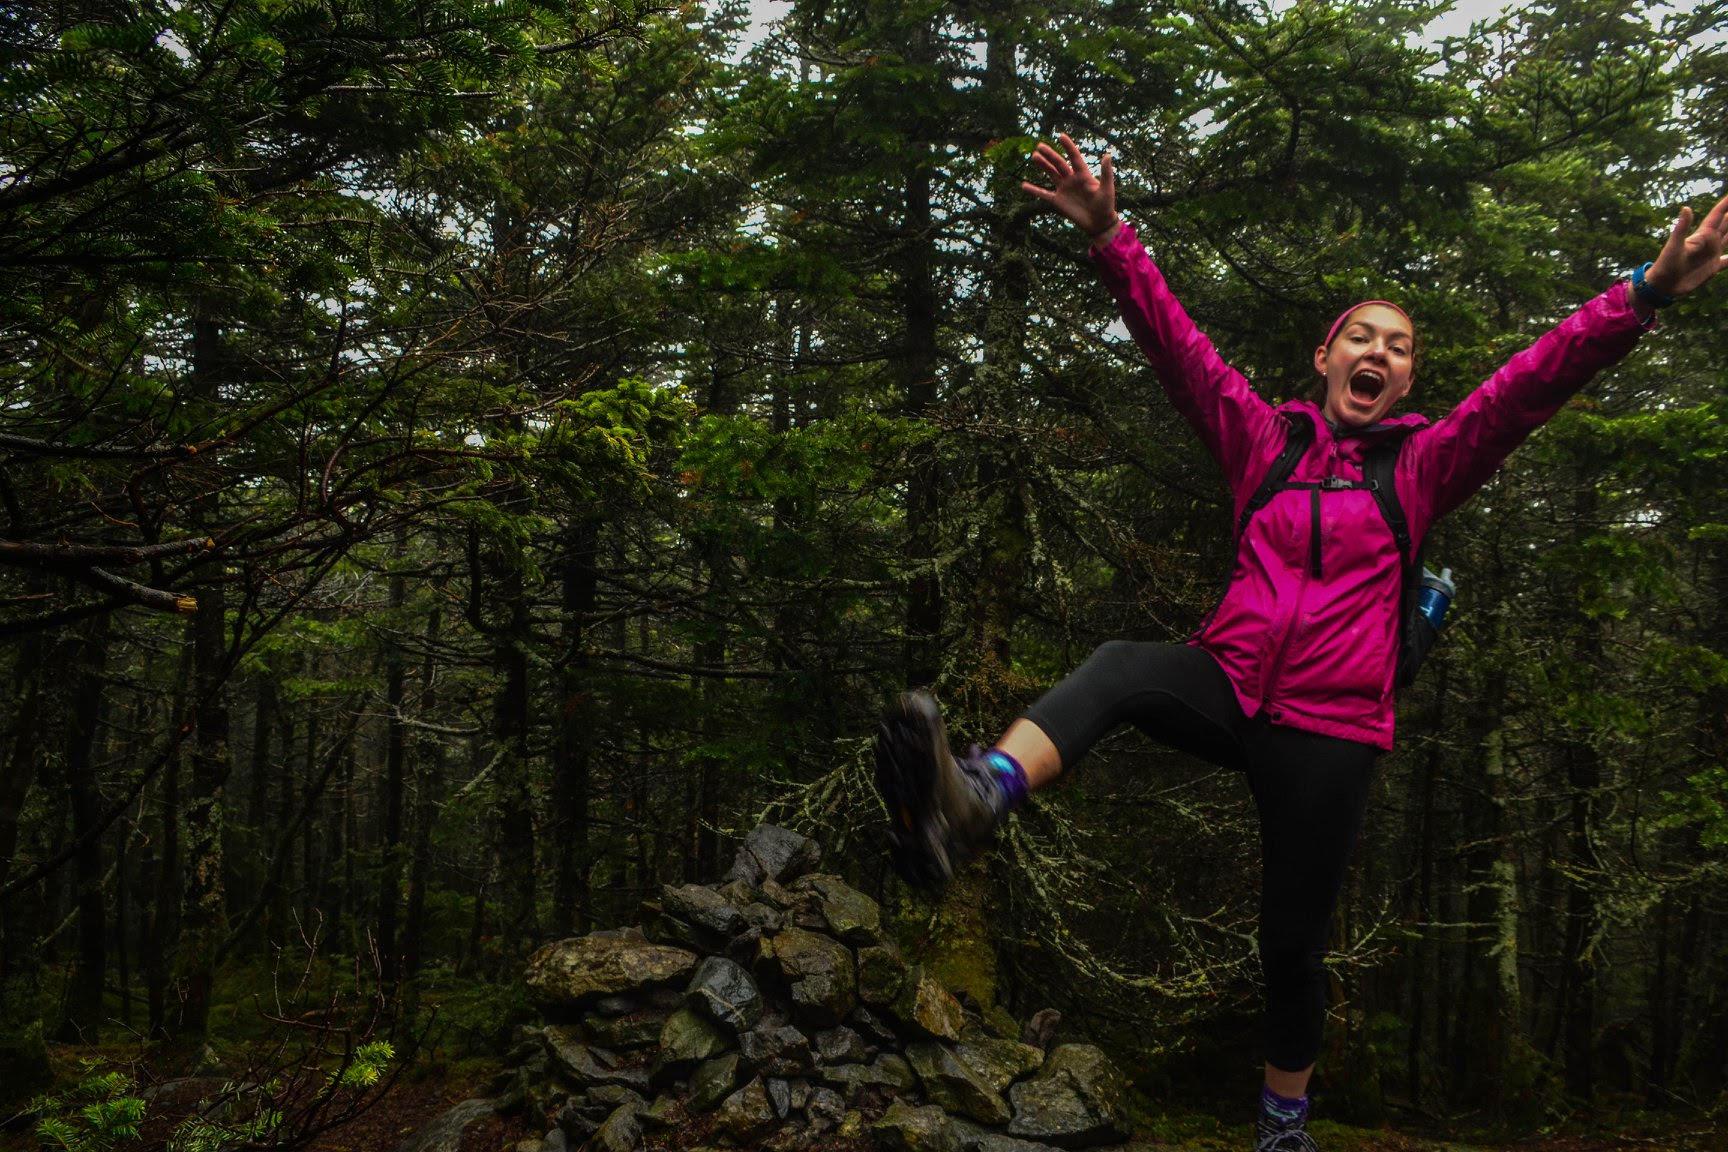 Siobhan Shamlian  Tufts University  Challenge:  Kilimanjaro